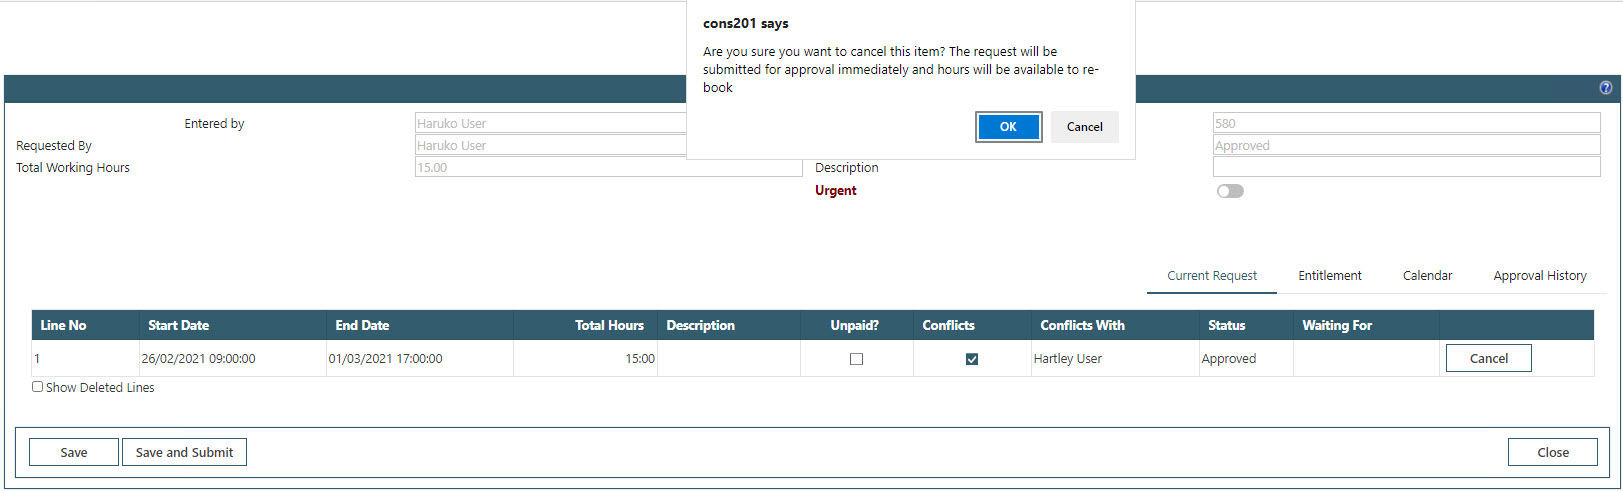 Sicon WAP Holidays Help and User Guide - WAP Holidays HUG Section 14.2 - Image 1